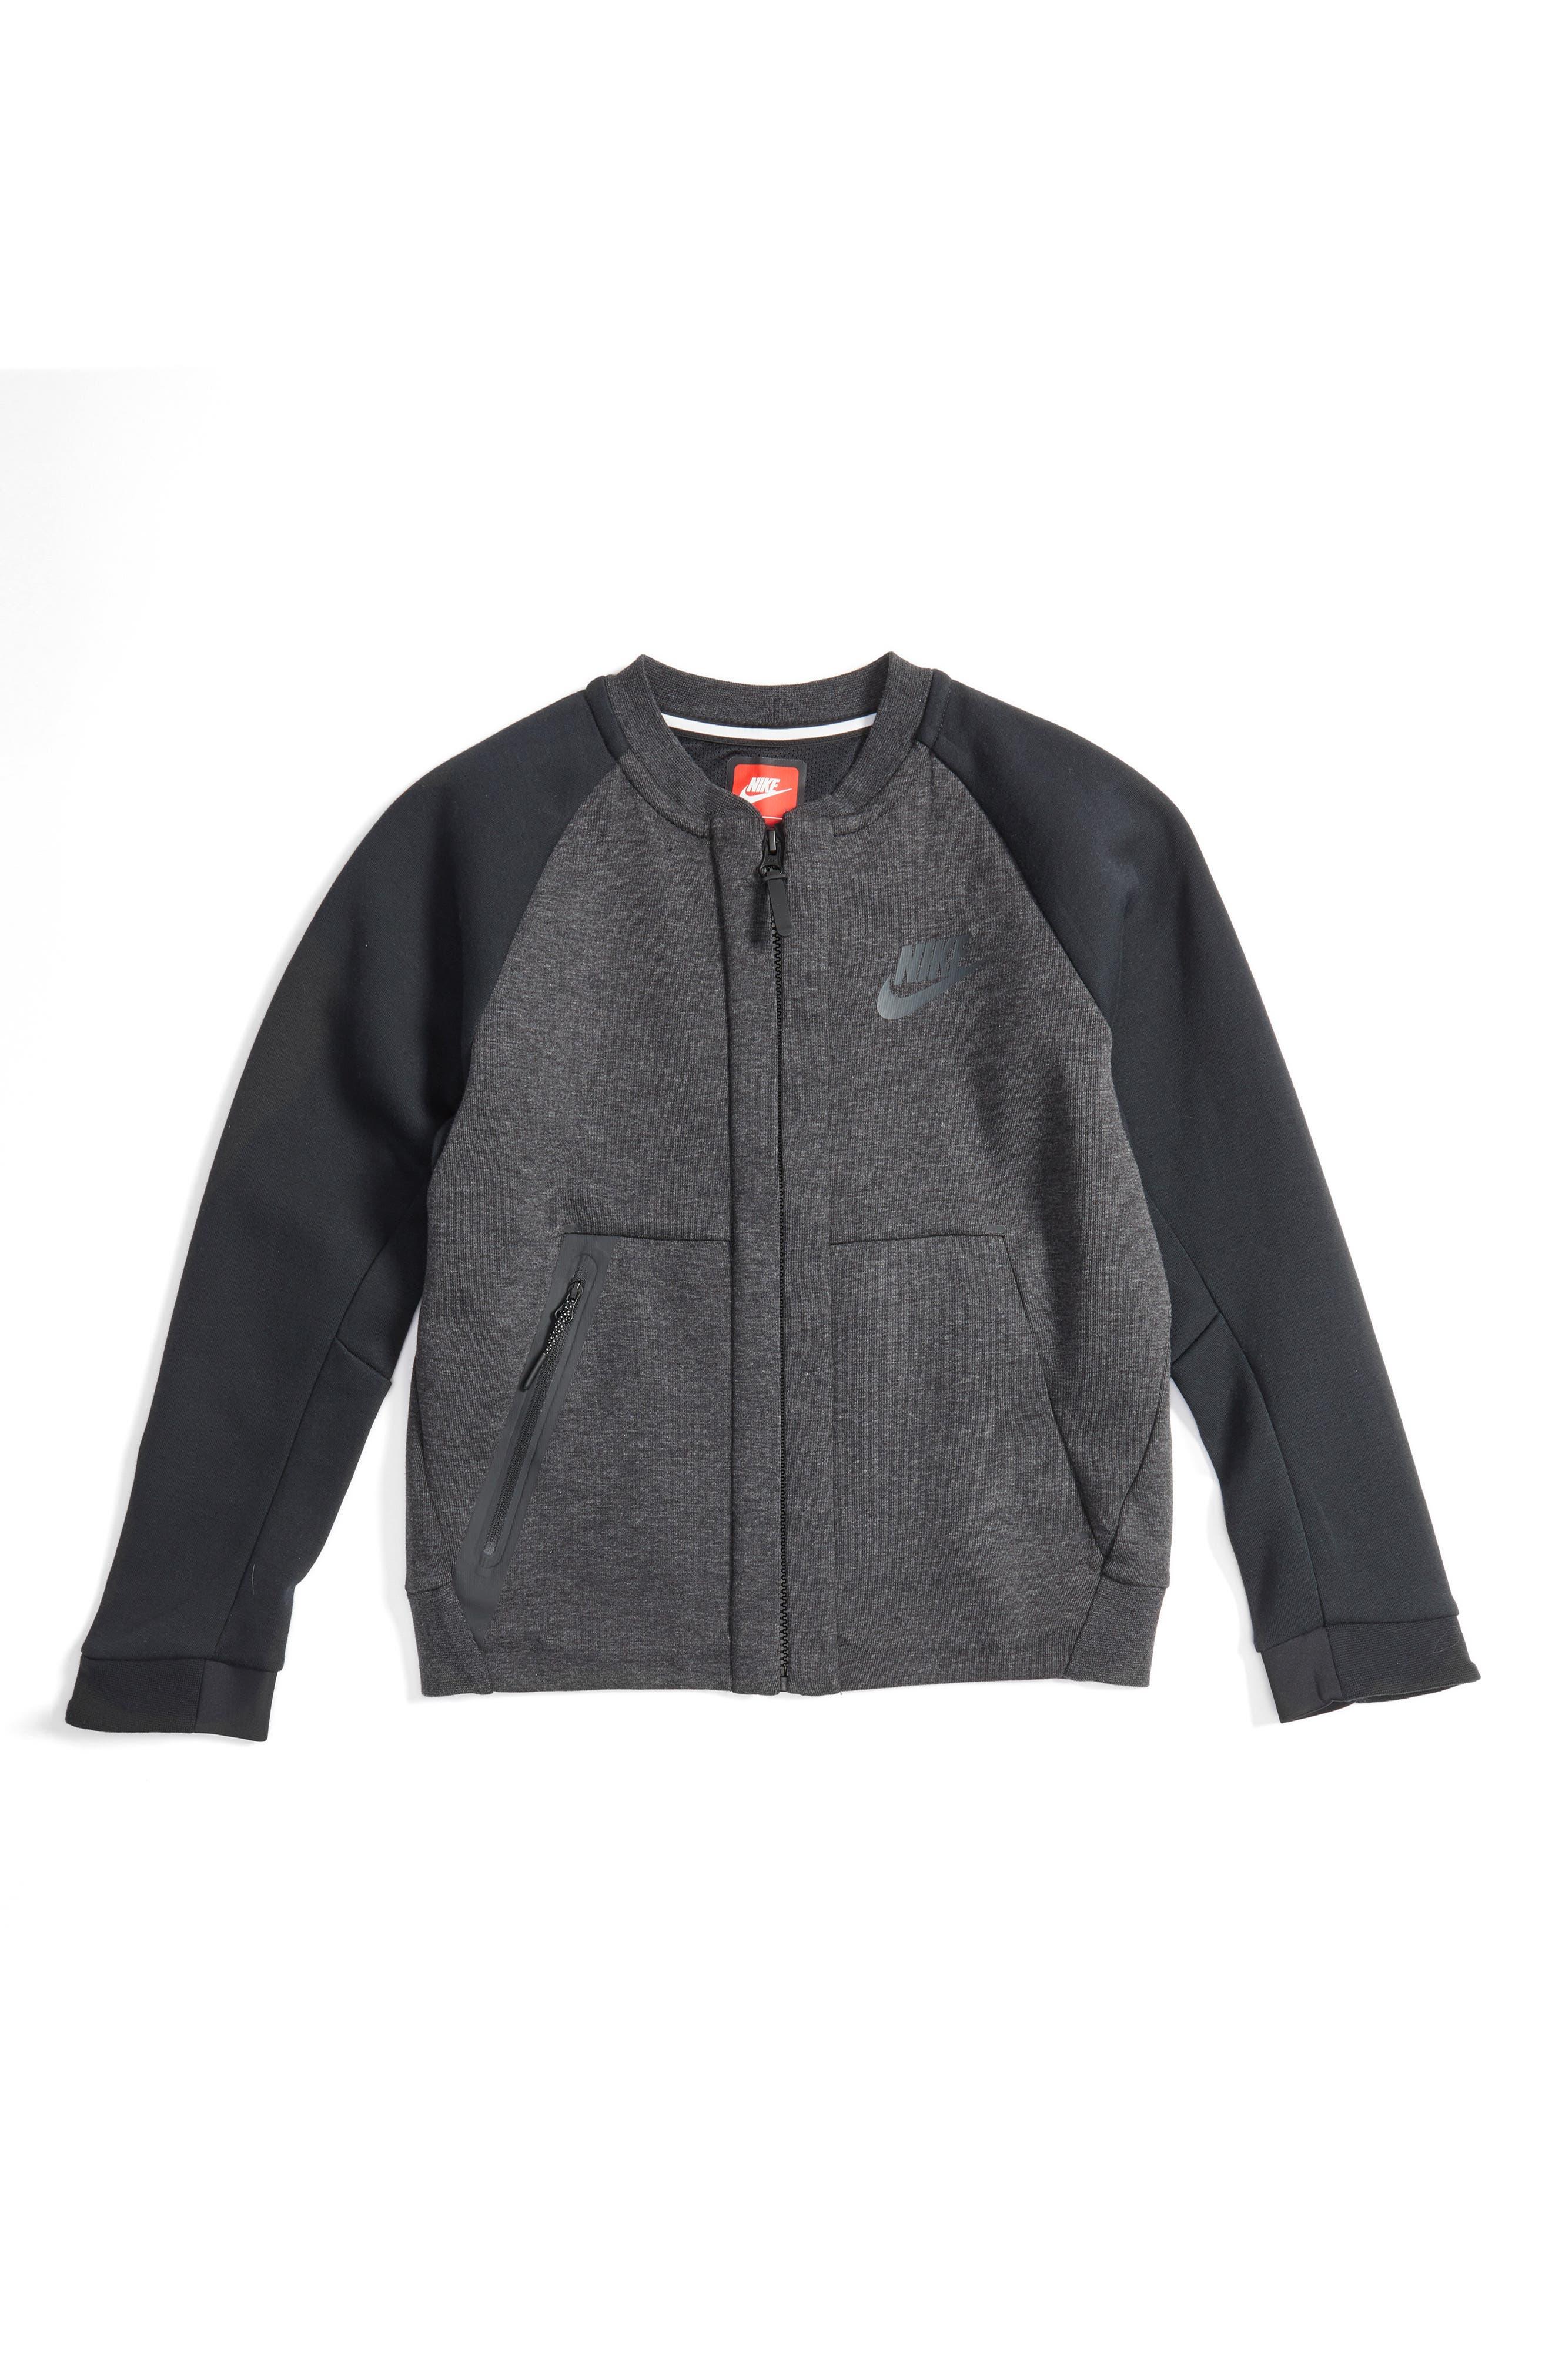 Sportswear Tech Fleece Bomber Jacket,                         Main,                         color, Blk H/ Anthra